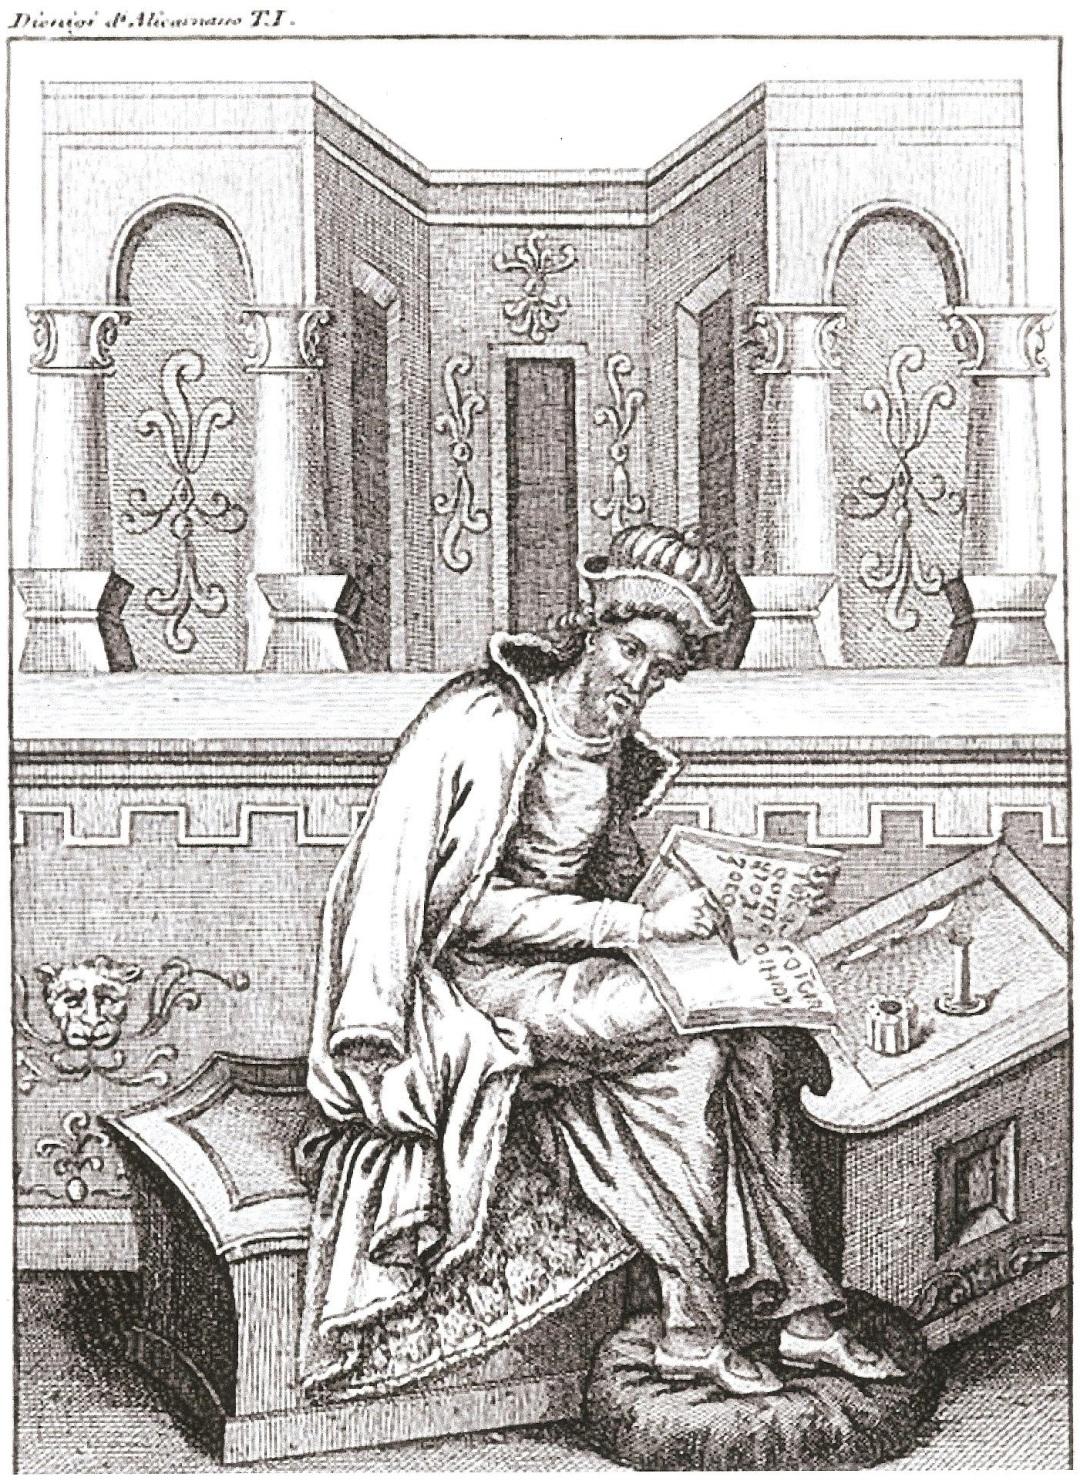 dionysius-of-halicarnassus-001.jpg